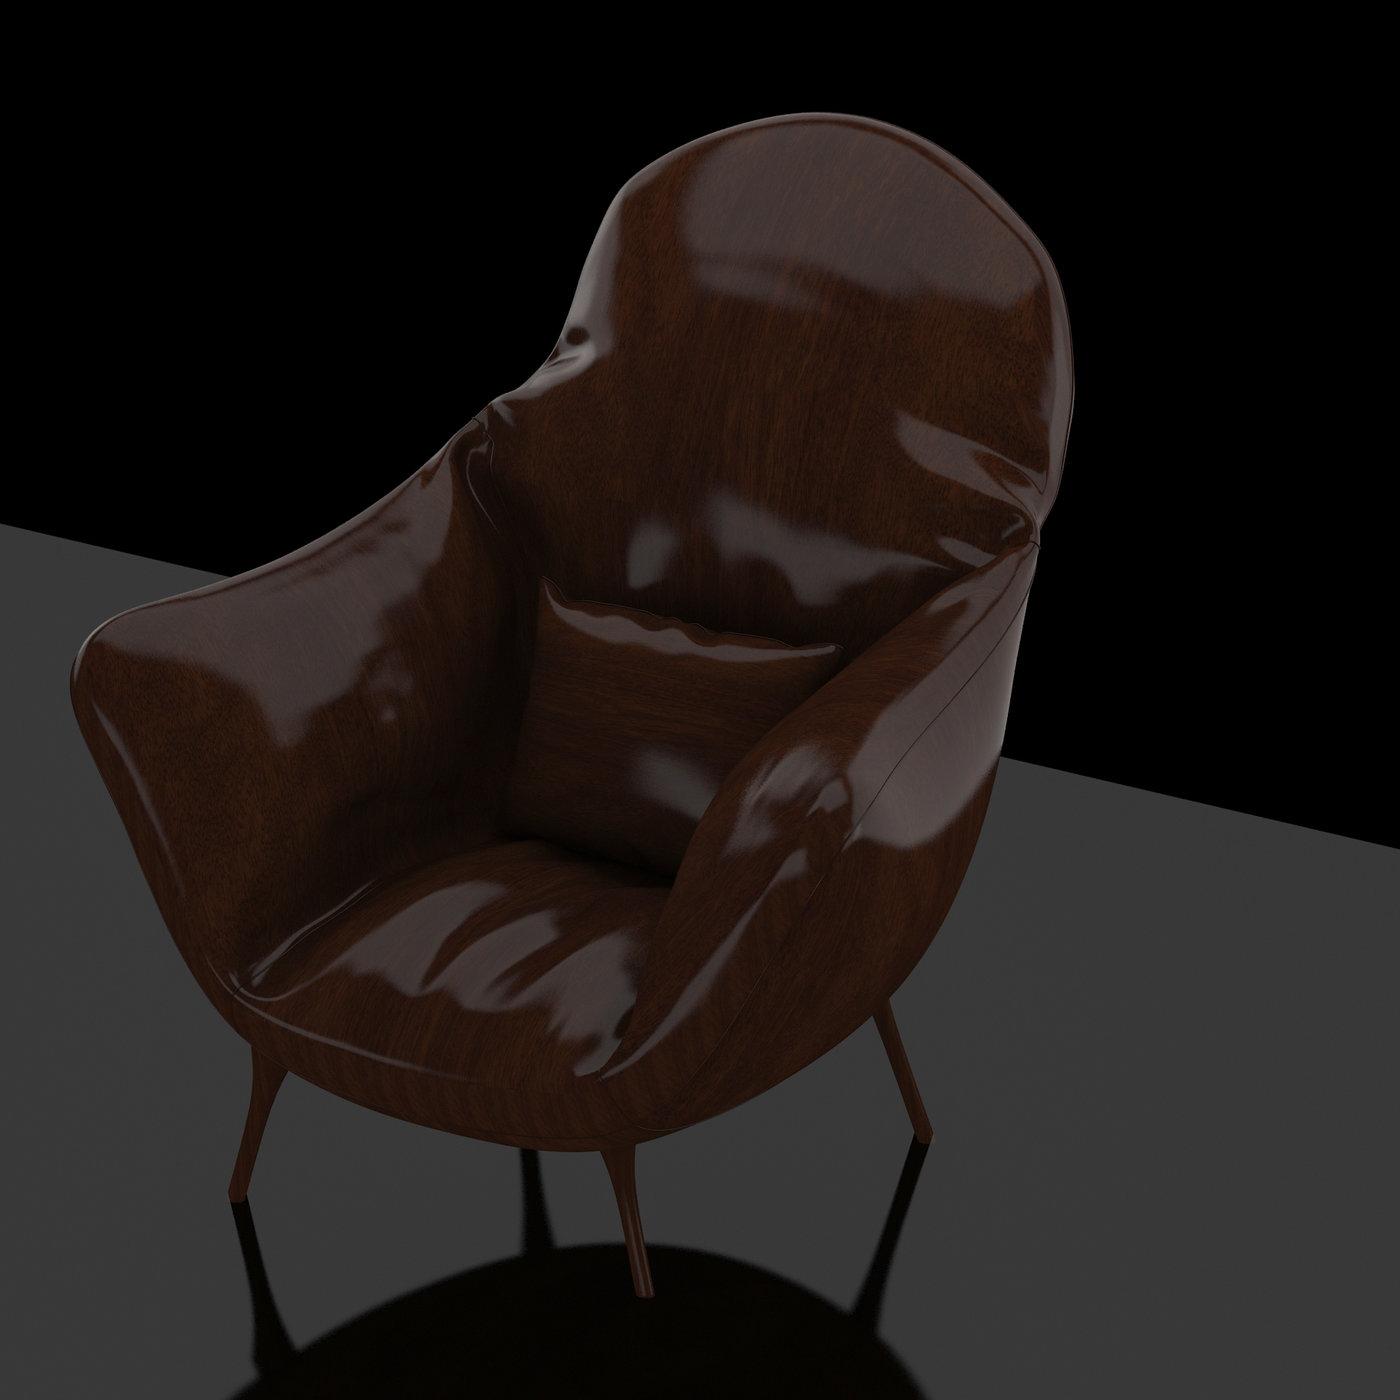 sofa design, Plastic Materials Lights Rendering Rendering 3DSMAX